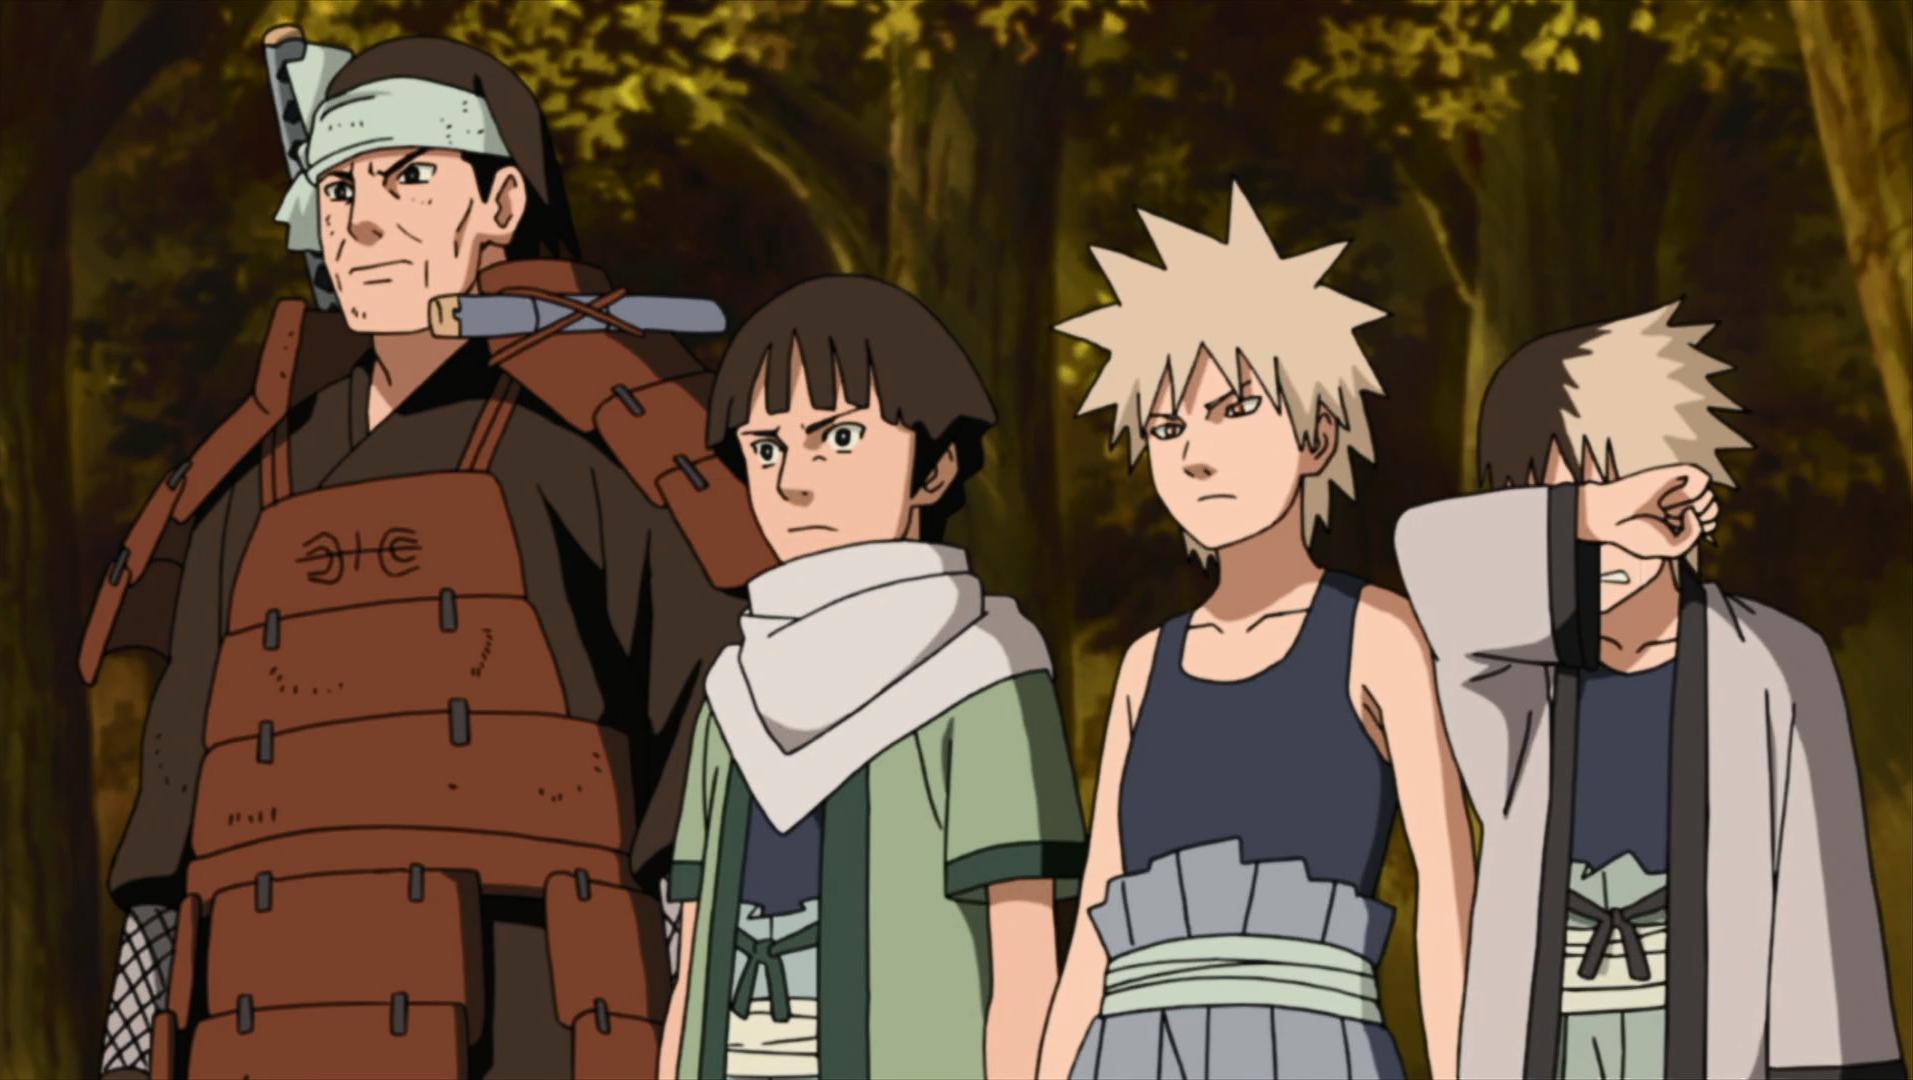 Tobirama Senju | Narutopedia | FANDOM powered by Wikia